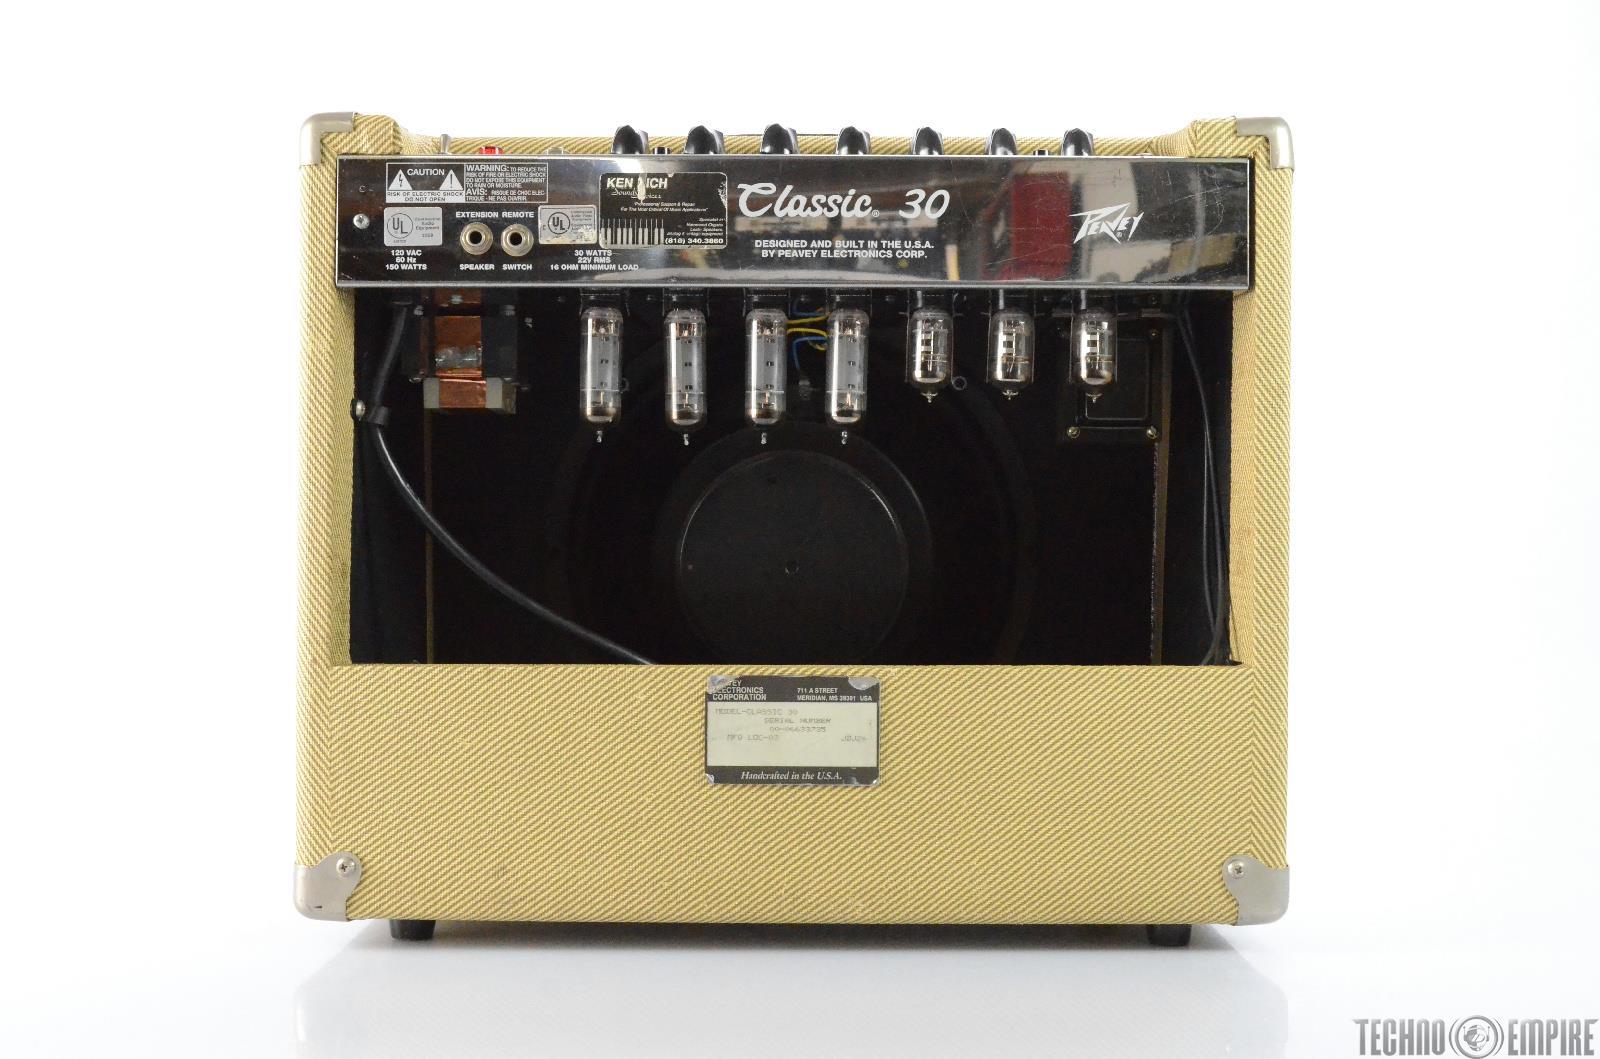 peavey classic 30 1x12 30 watt tweed tube guitar combo amp amplifier 27763. Black Bedroom Furniture Sets. Home Design Ideas